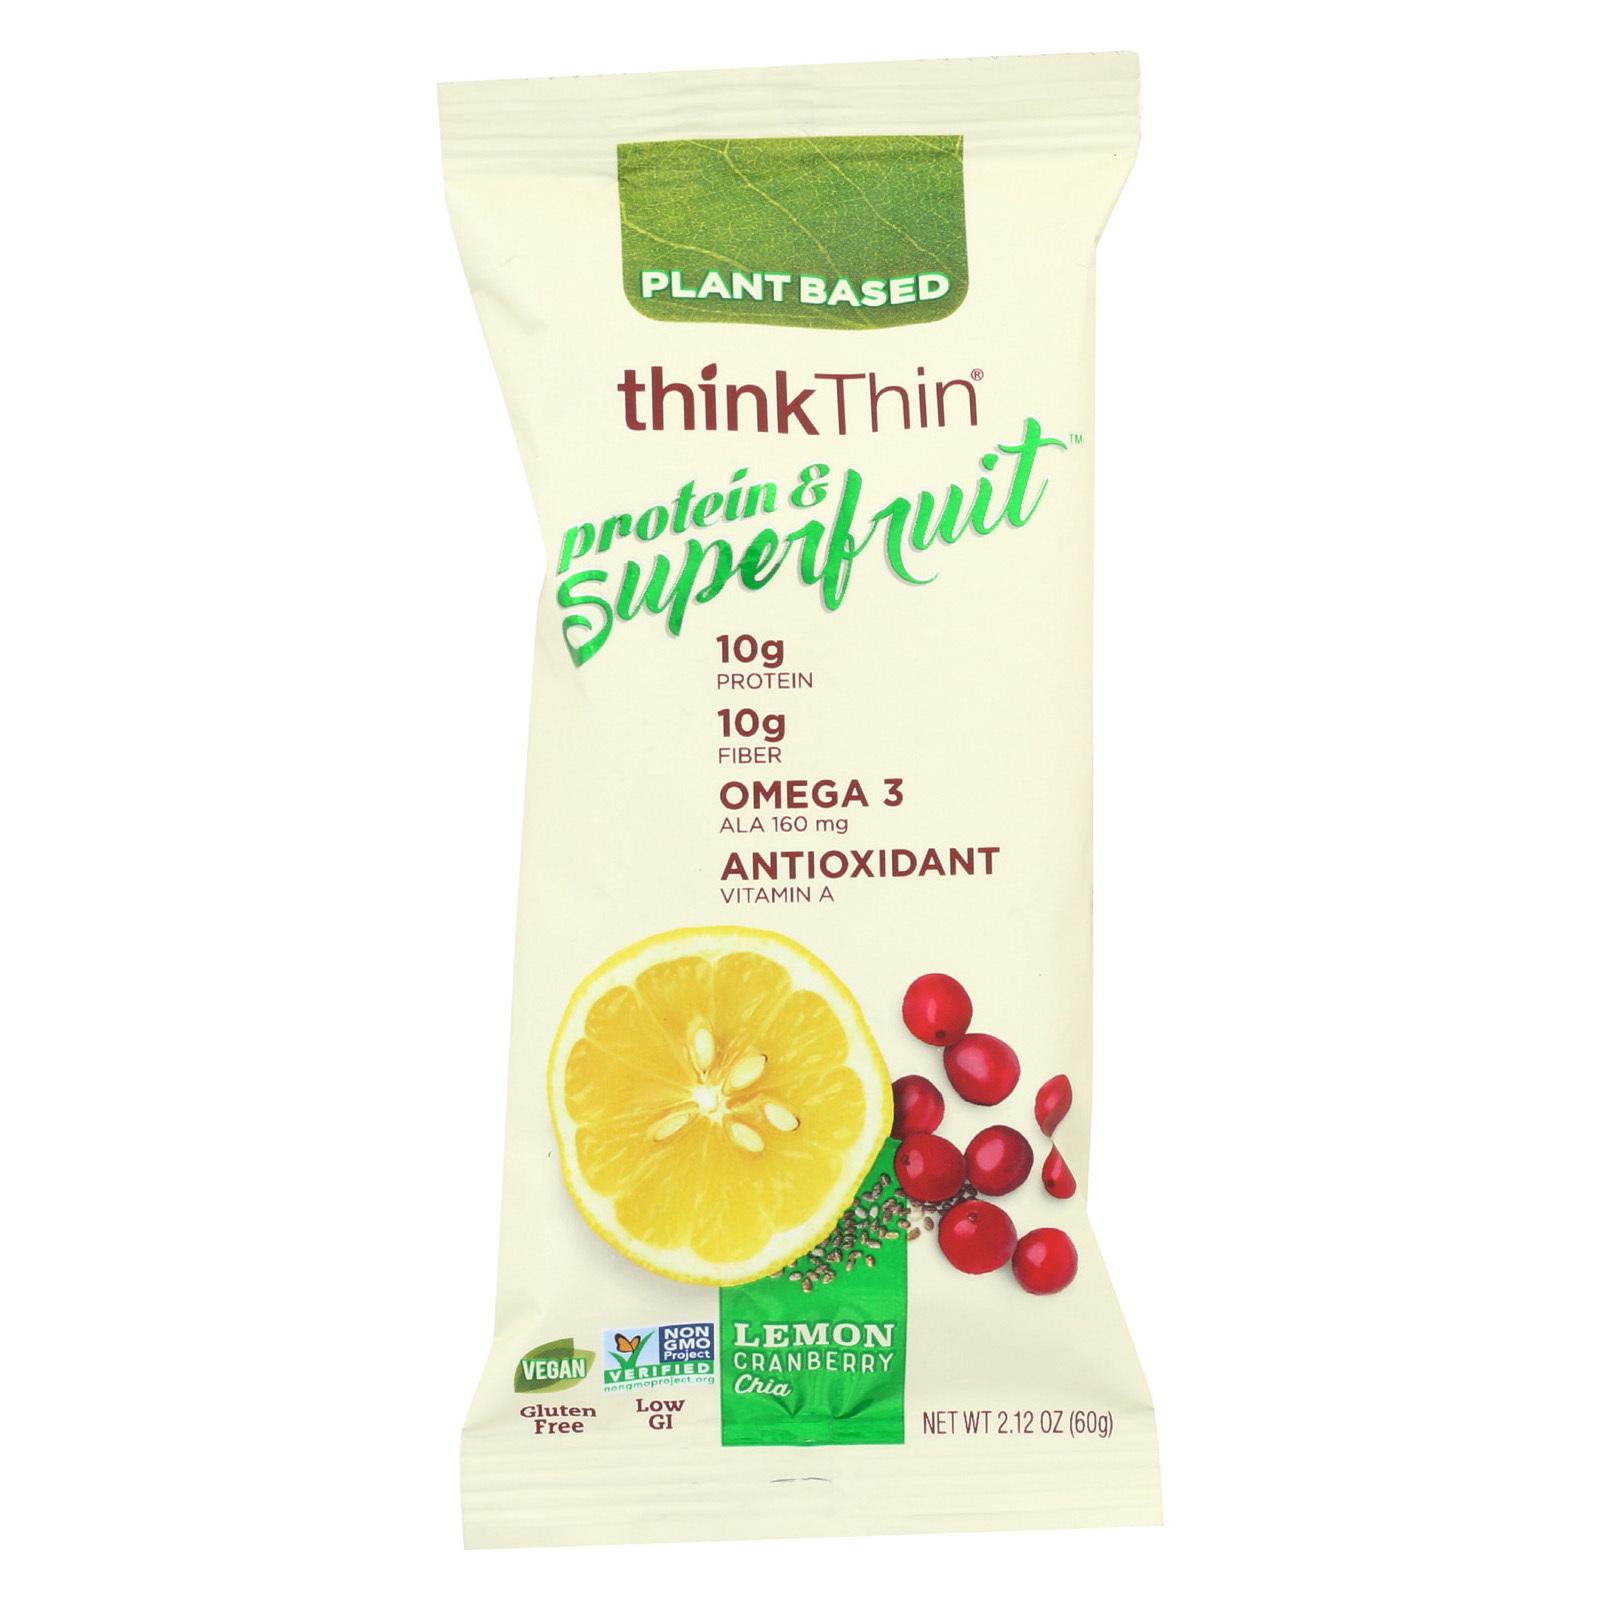 Think! Thin Protein & Superfruit - Lemon Cranberry Chia - Case of 9 - 2.1 oz